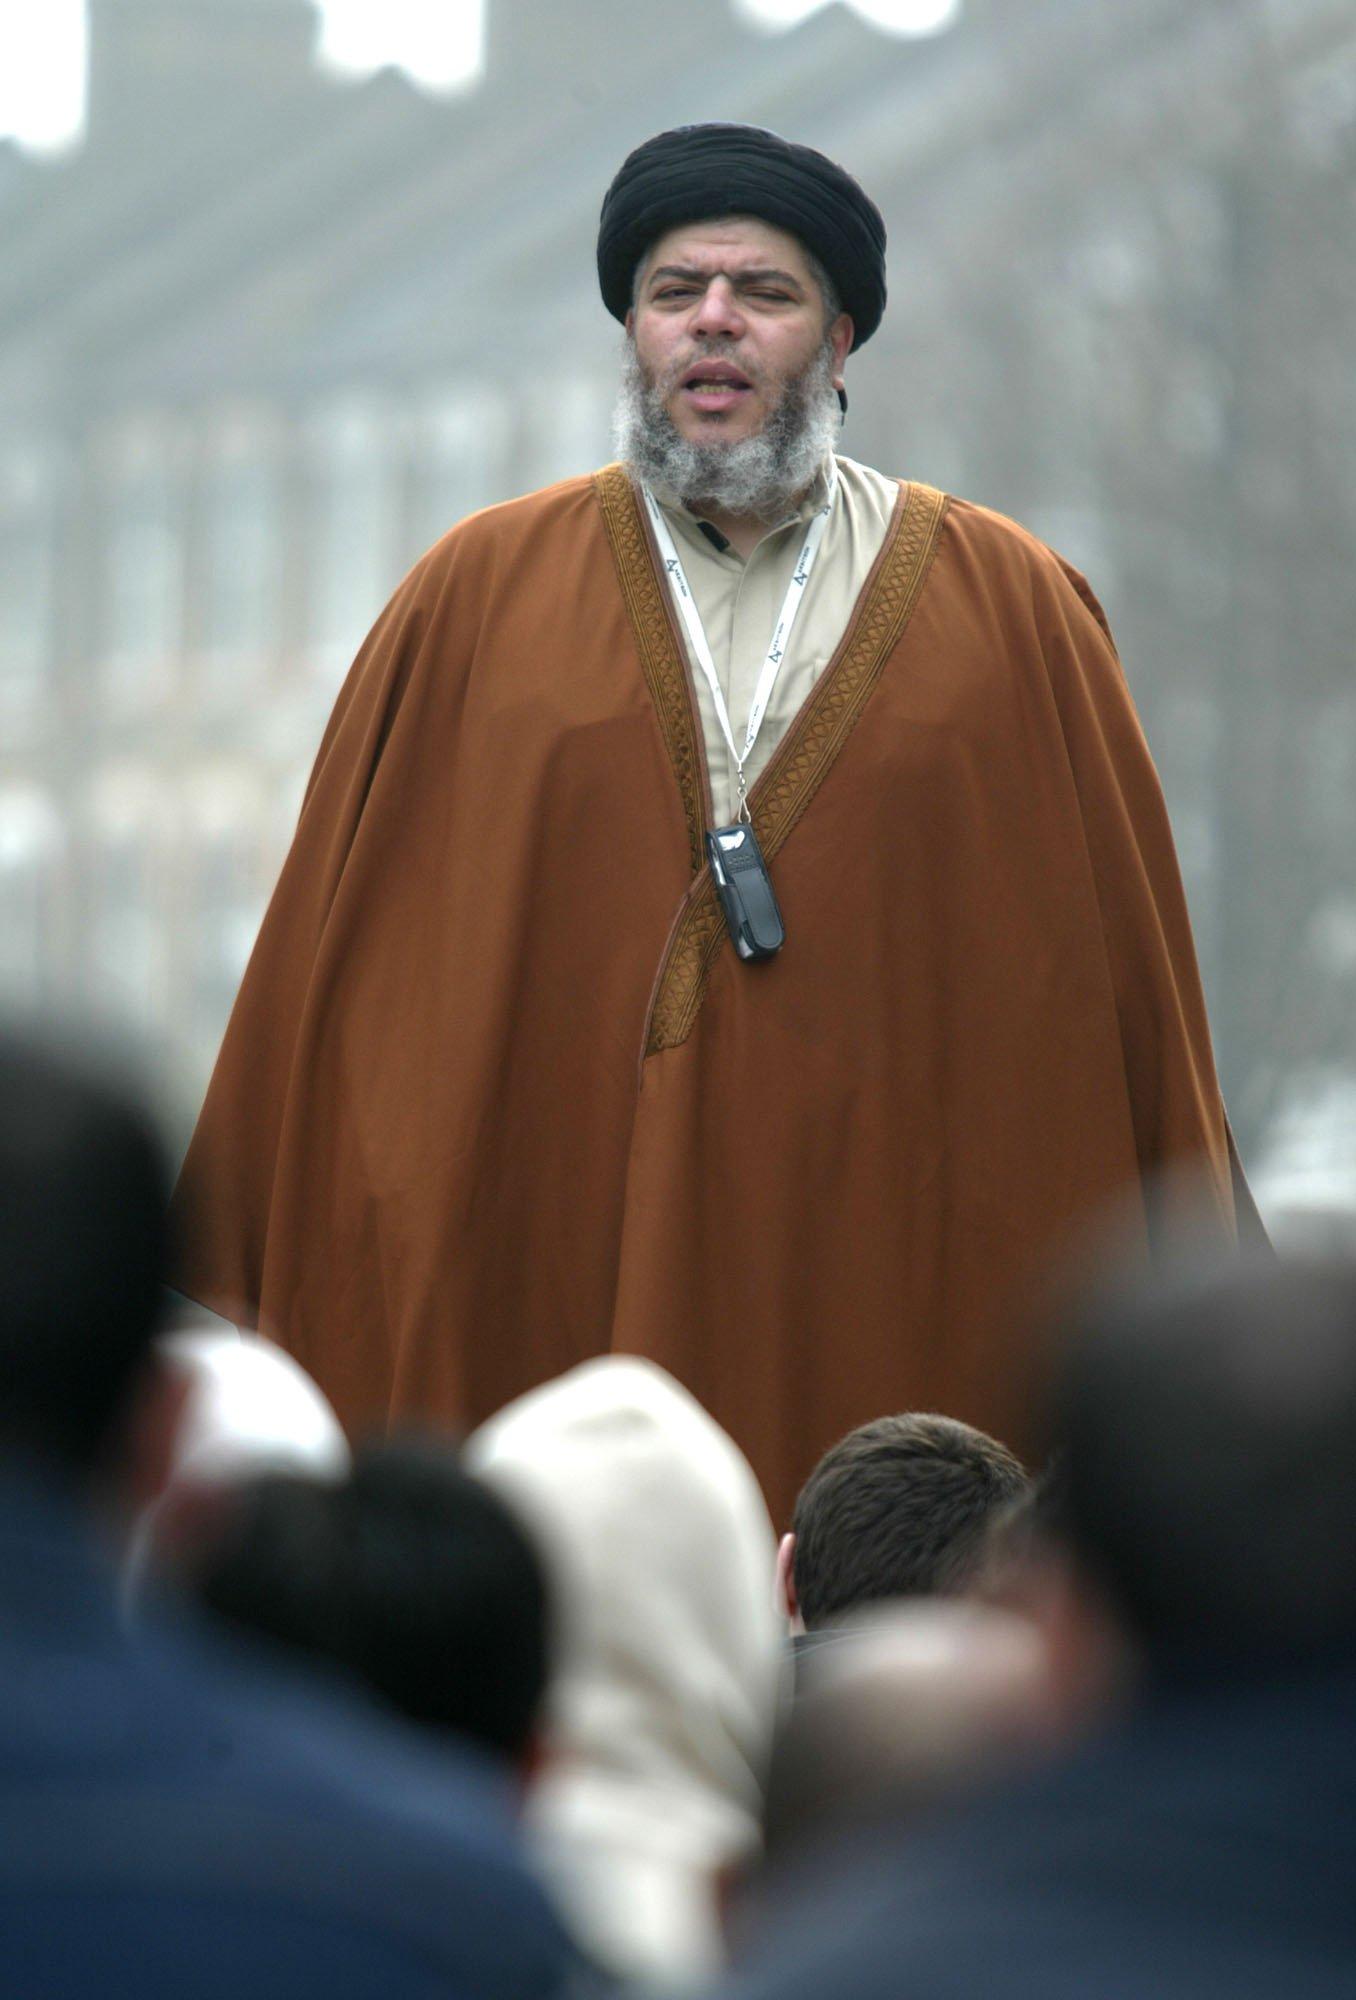 Muslim cleric Mustafa Kamel Mustafa prays in a street outside his Mosque in north London, on March 28, 2003.